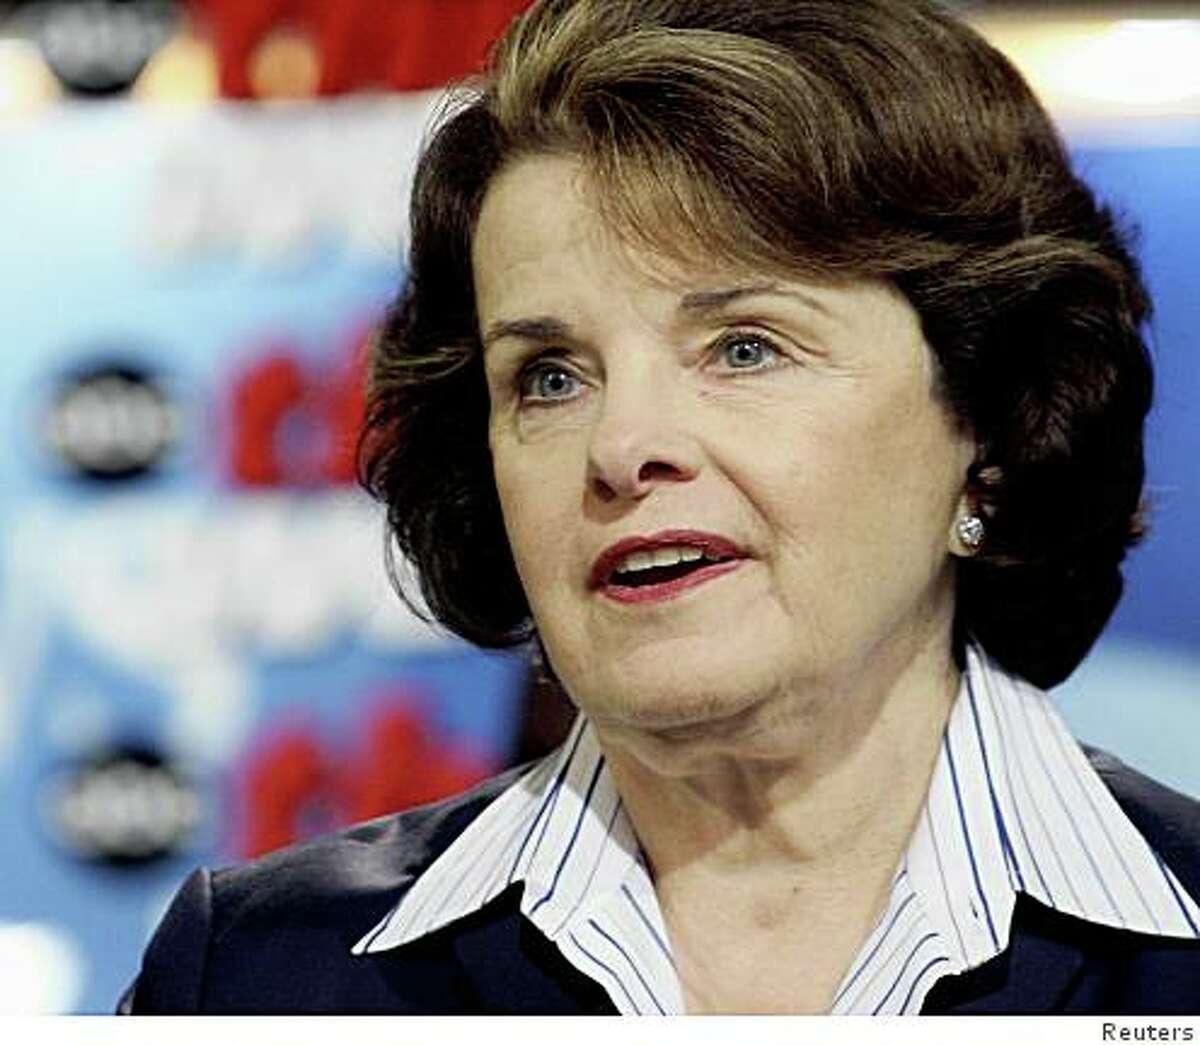 ".S. Senator Dianne Feinstein (D-CA), speaks about the California wildfires on ABC News' ""This Week"" in Washington, October 28, 2007. REUTERS/Lauren Victoria Burke/ABC NEWS//Handout"